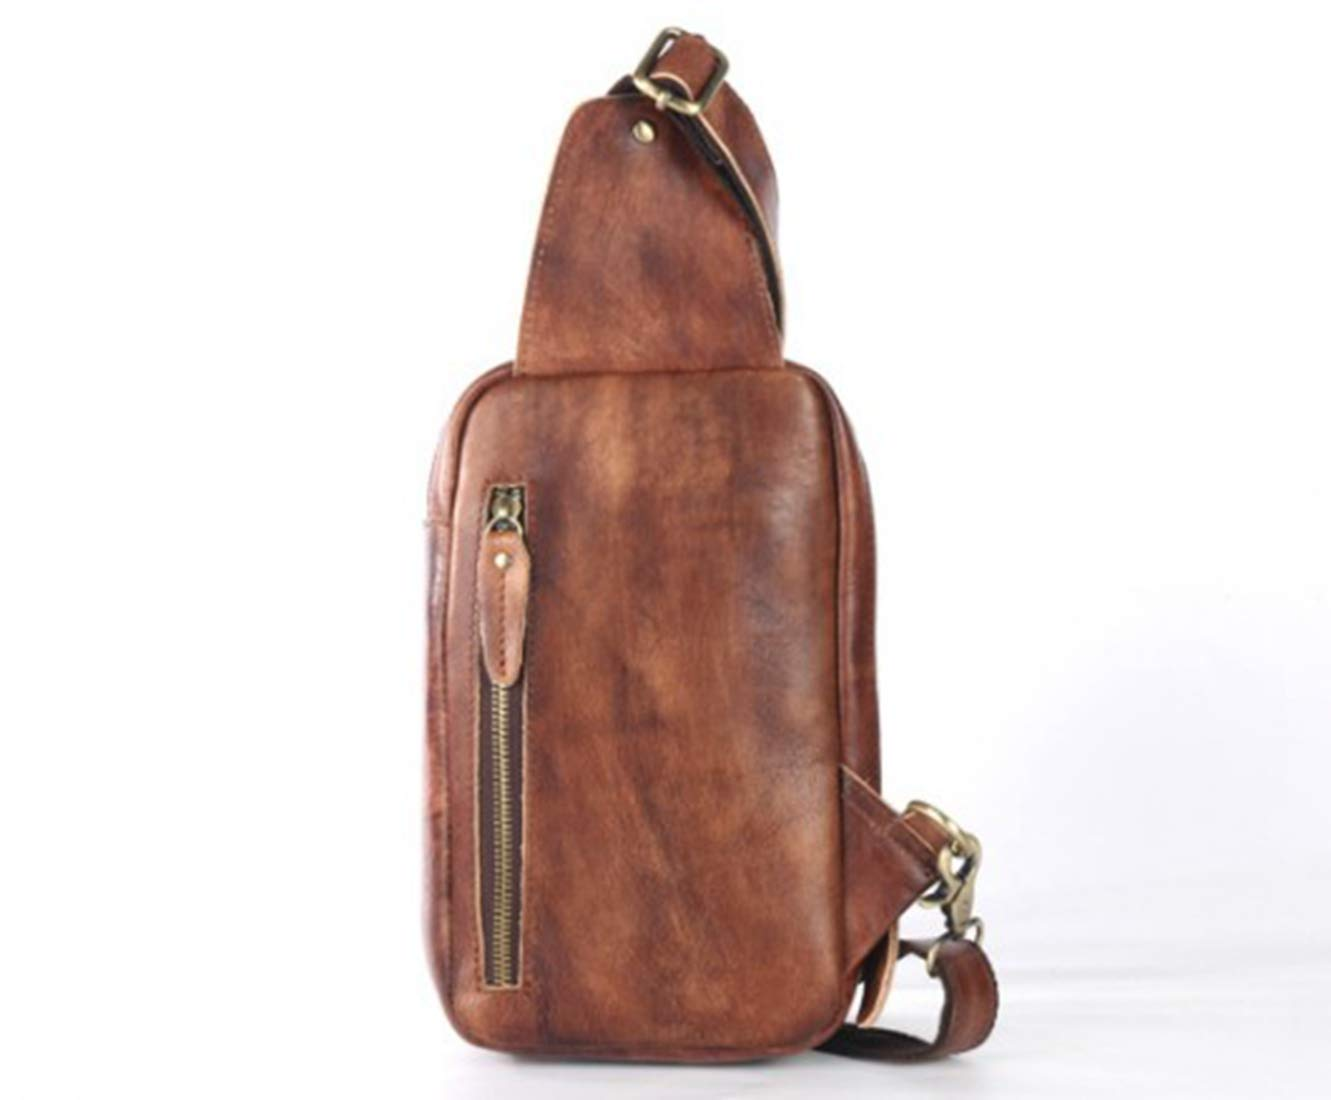 Color : Photo Color RABILTY Mens Genuine Leather Chest Bag Crossbody Shoulder Bag Messenger Bag for Casual Business Sport Travel Brown